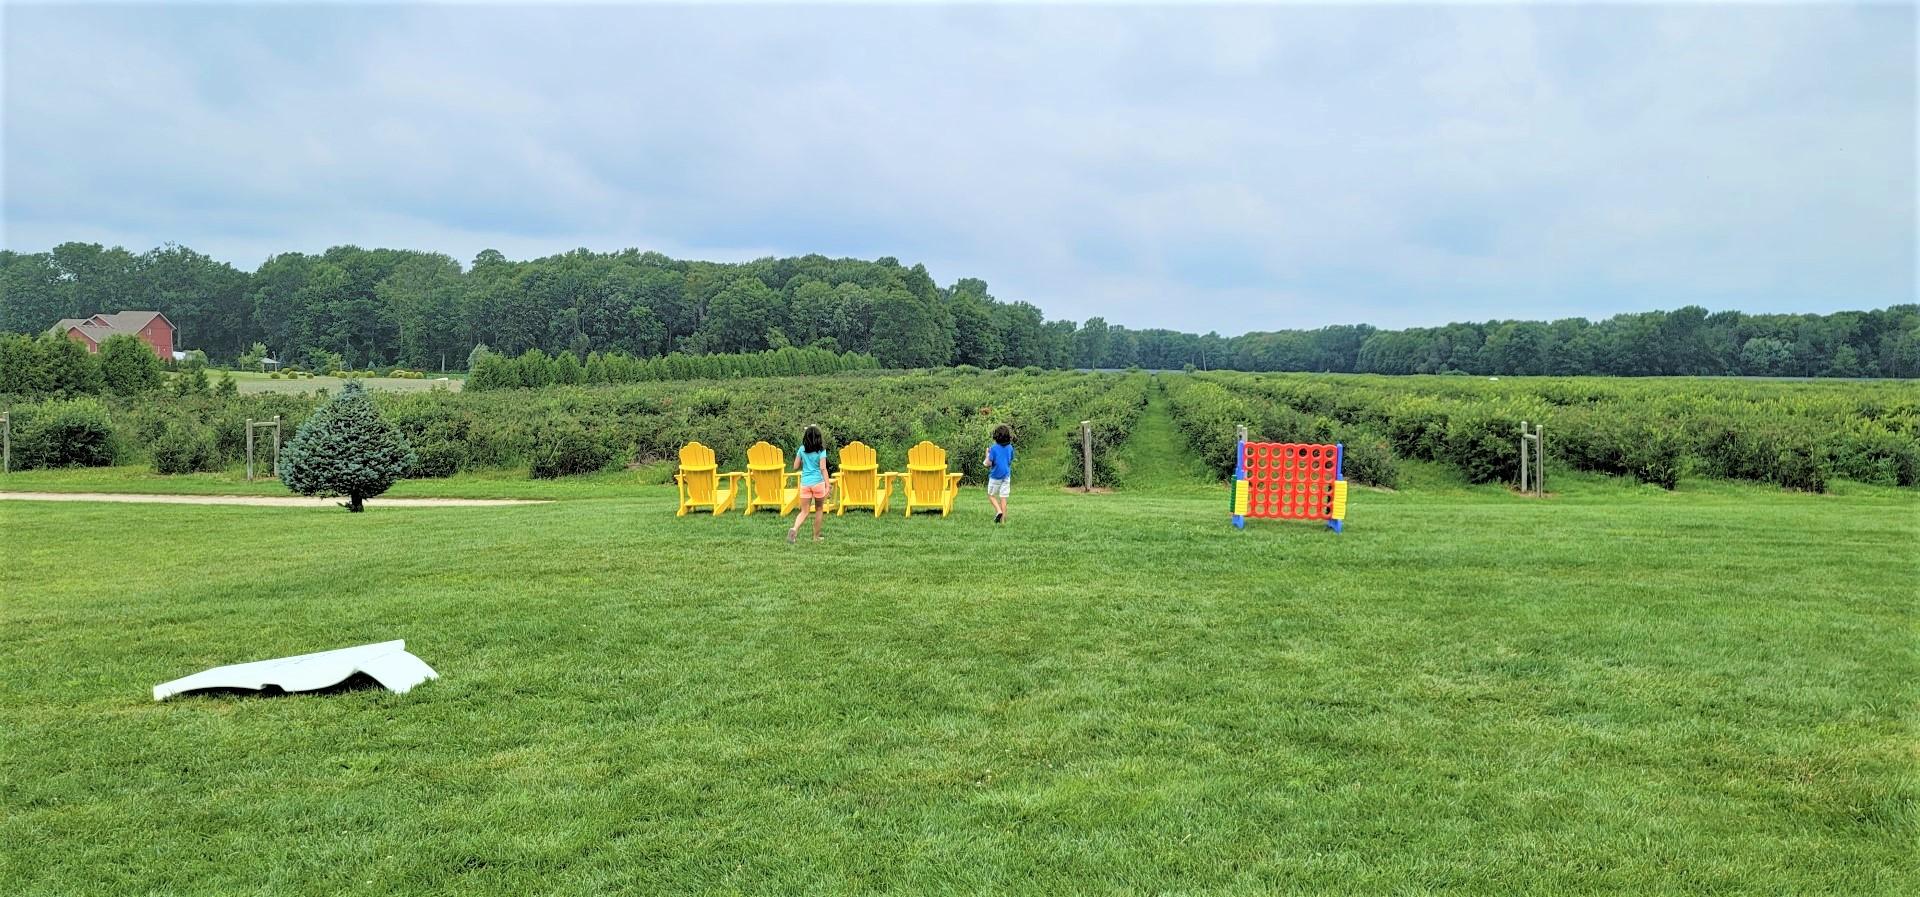 kids running toward yellow chairs at Ontario blueberry farm